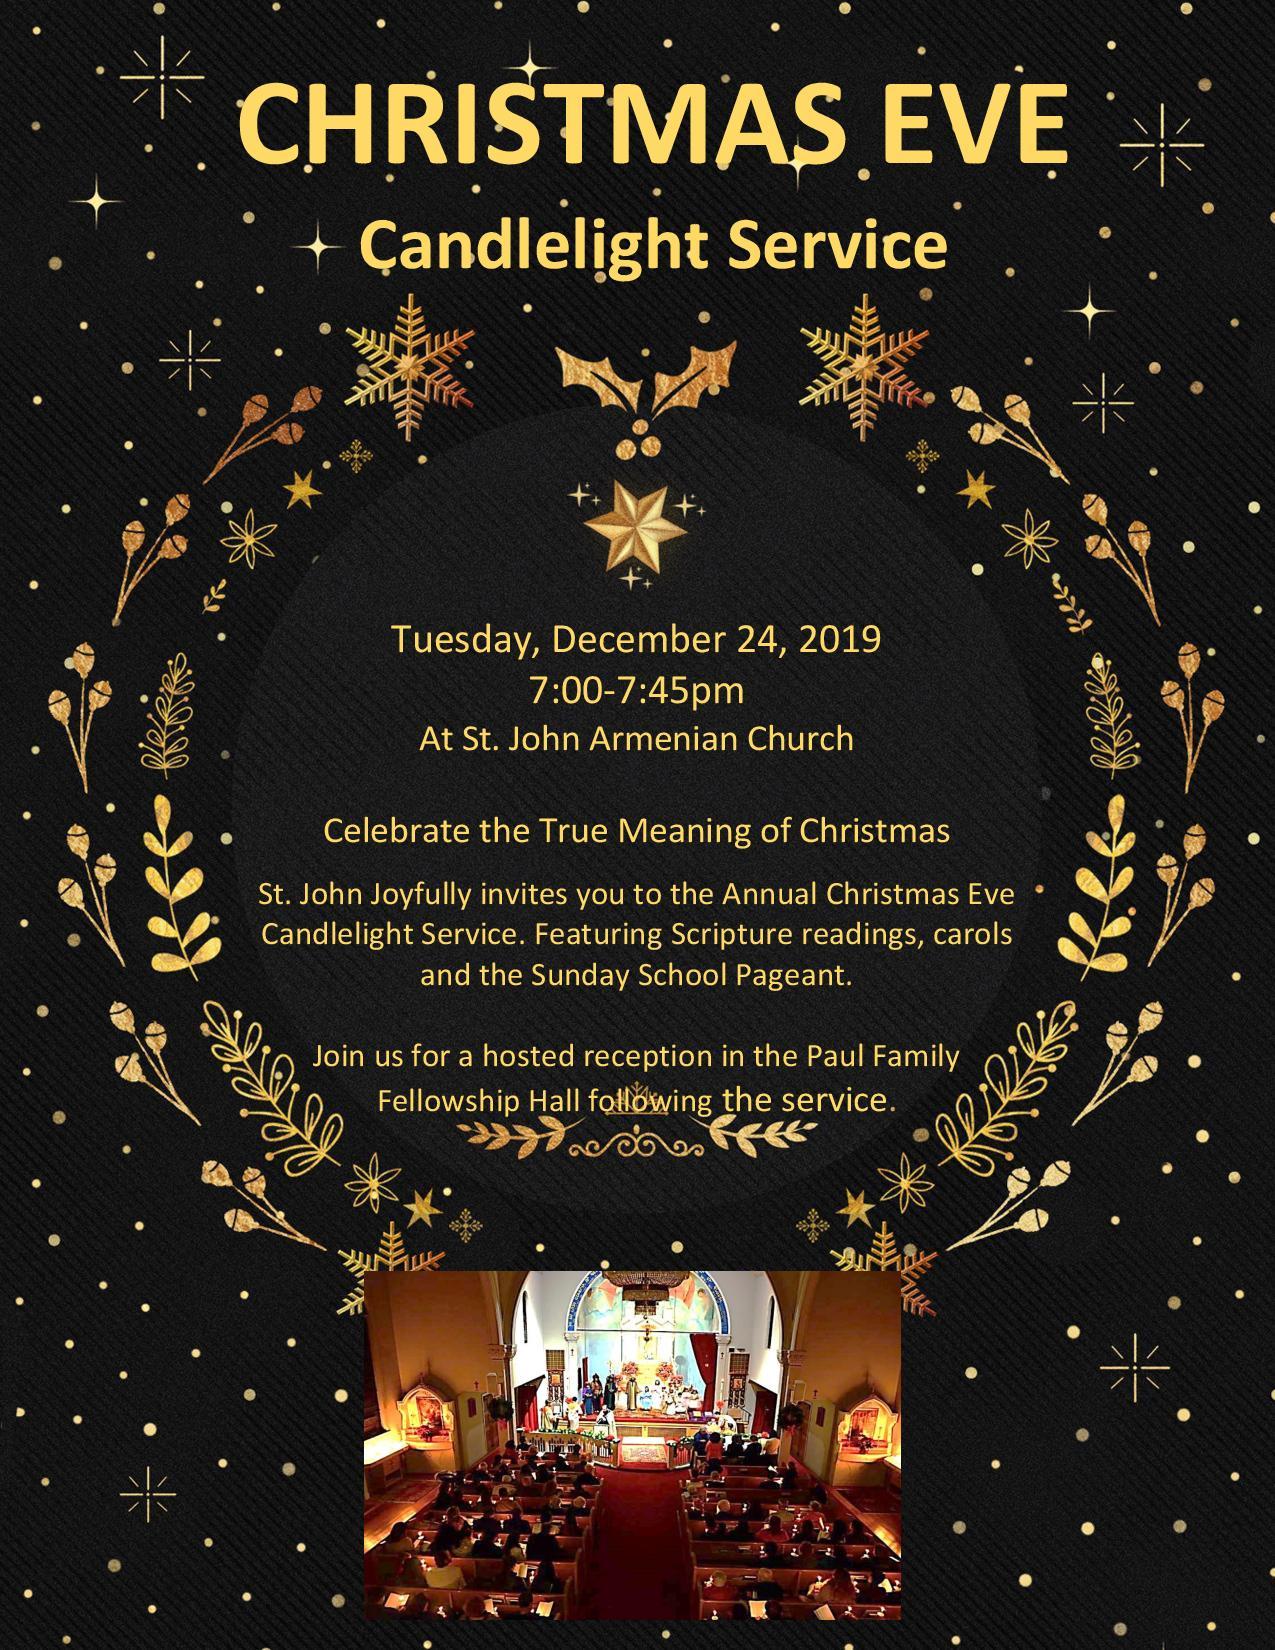 St Johns Christmas Pageant 2020 Christmas Eve Candlelight Service | St. John Armenian Apostolic Church